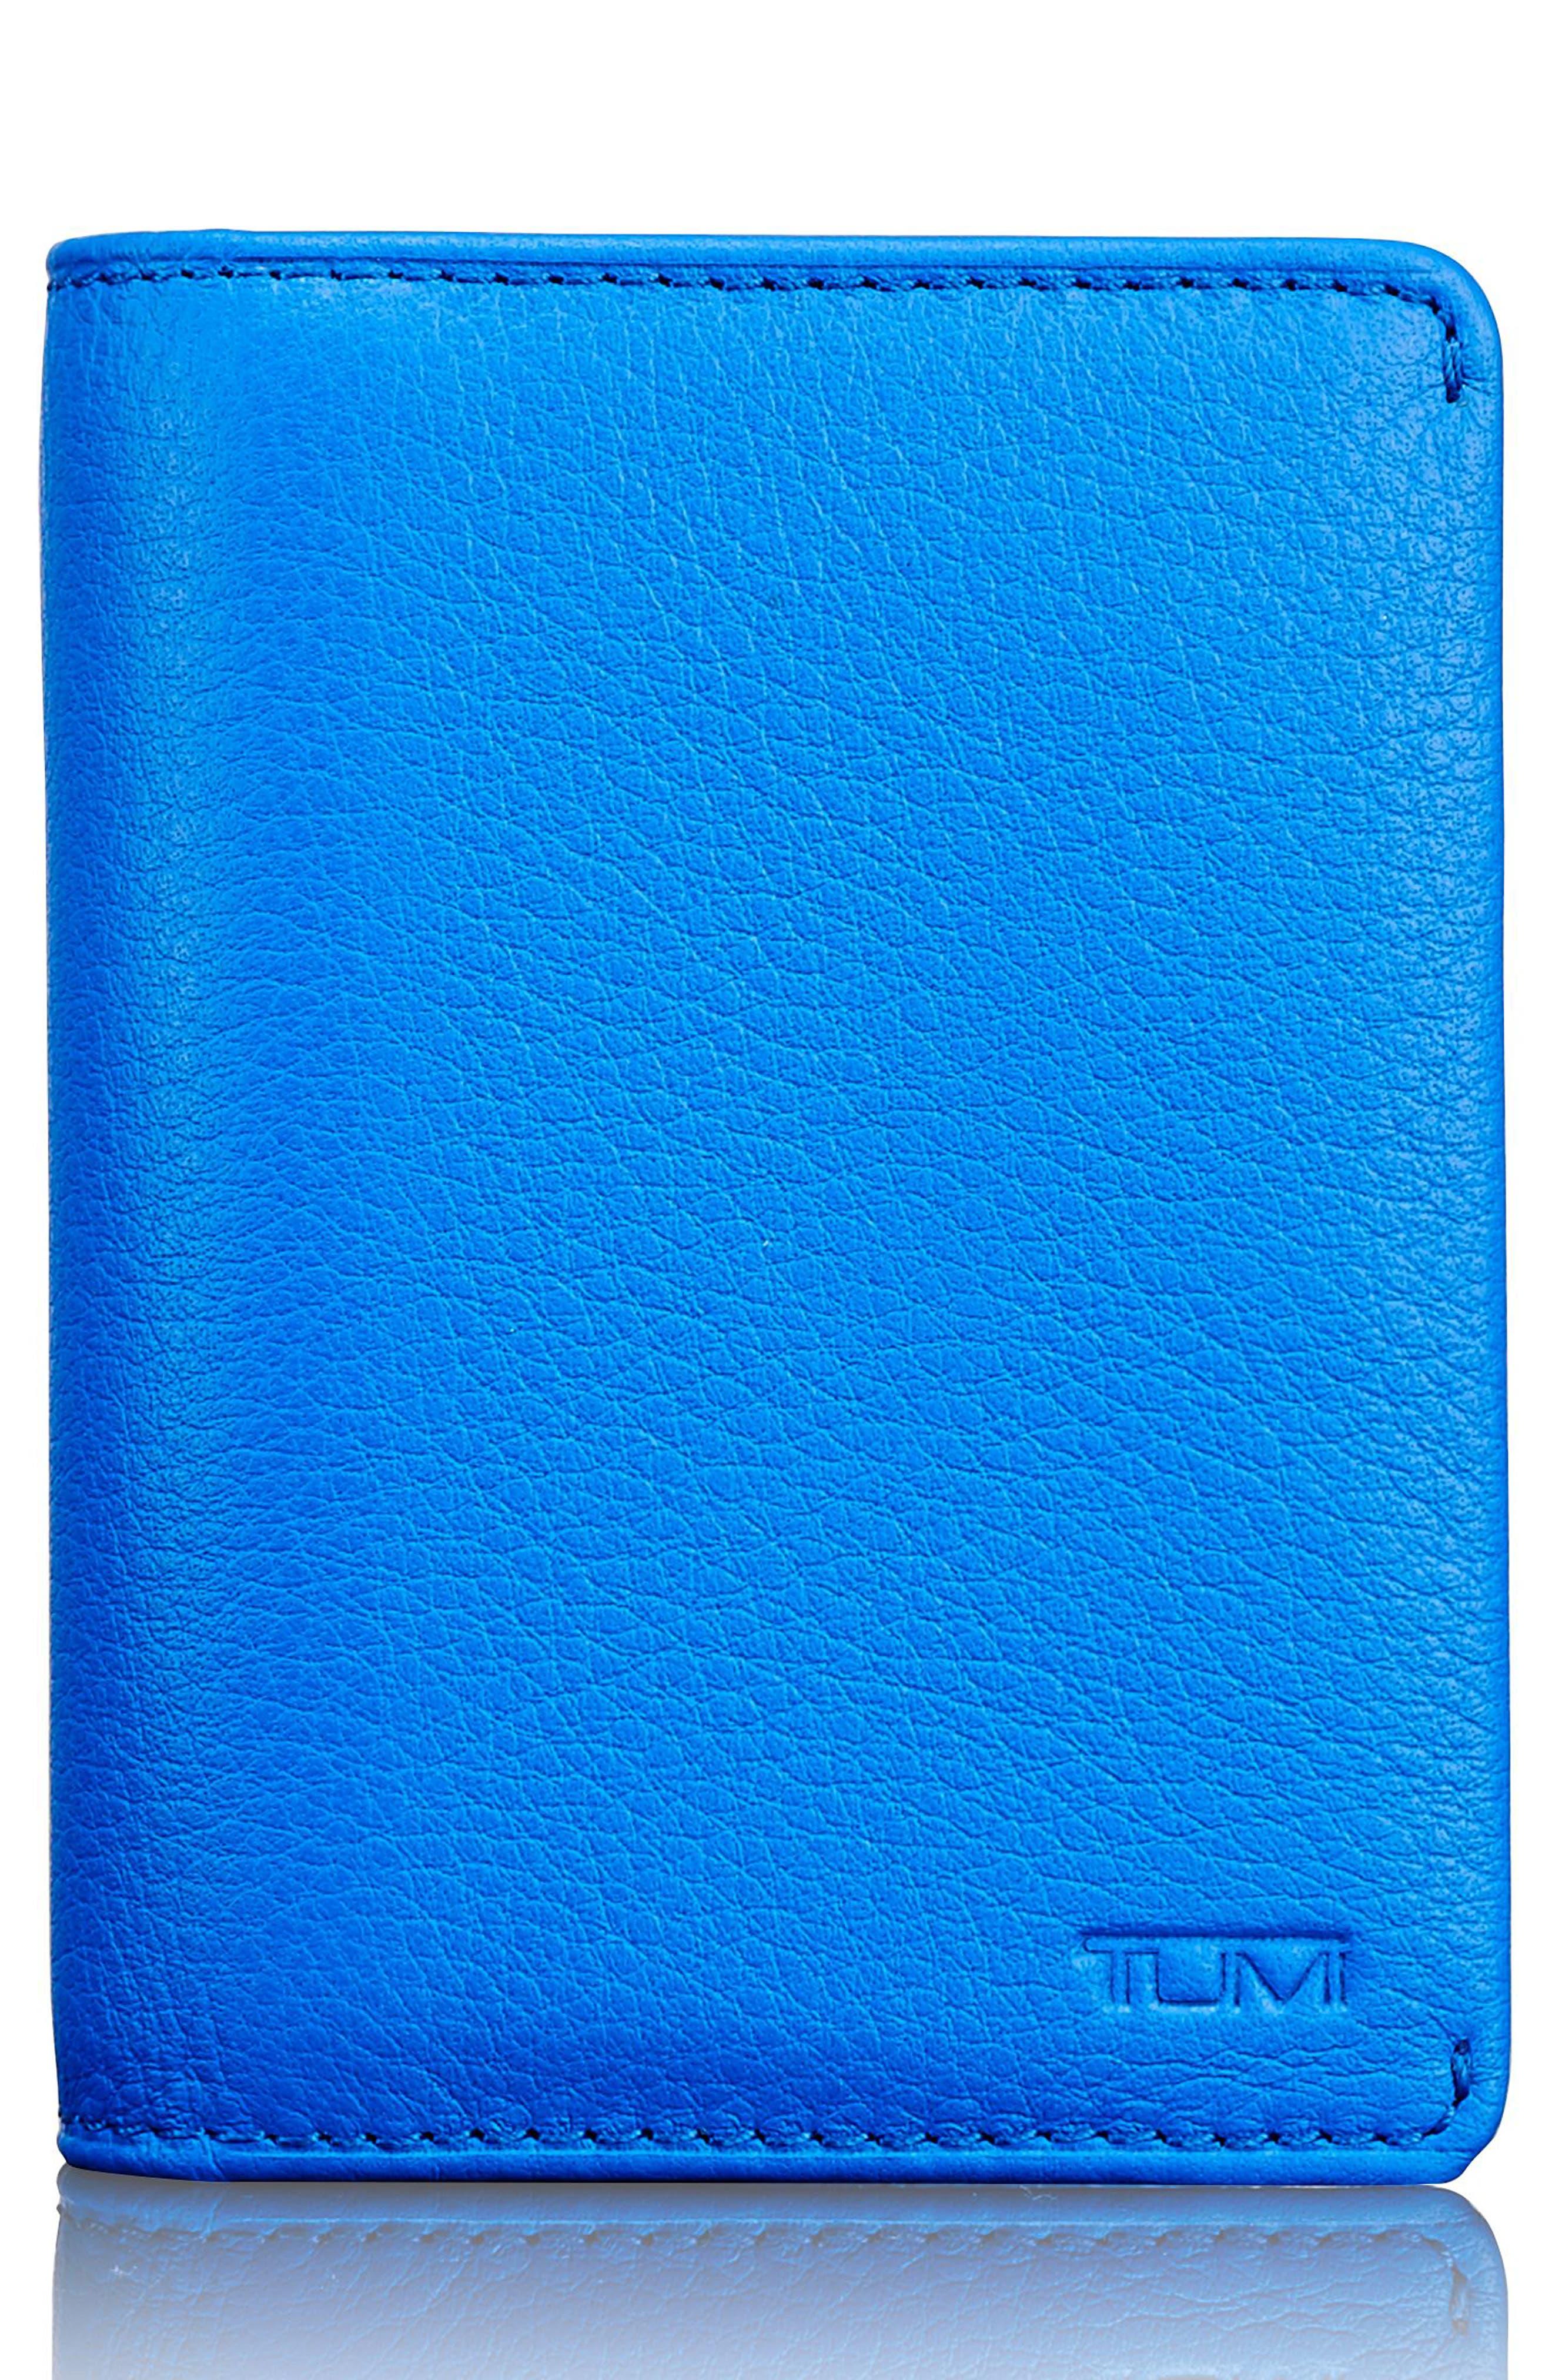 Main Image - Tumi Leather RFID Card Case